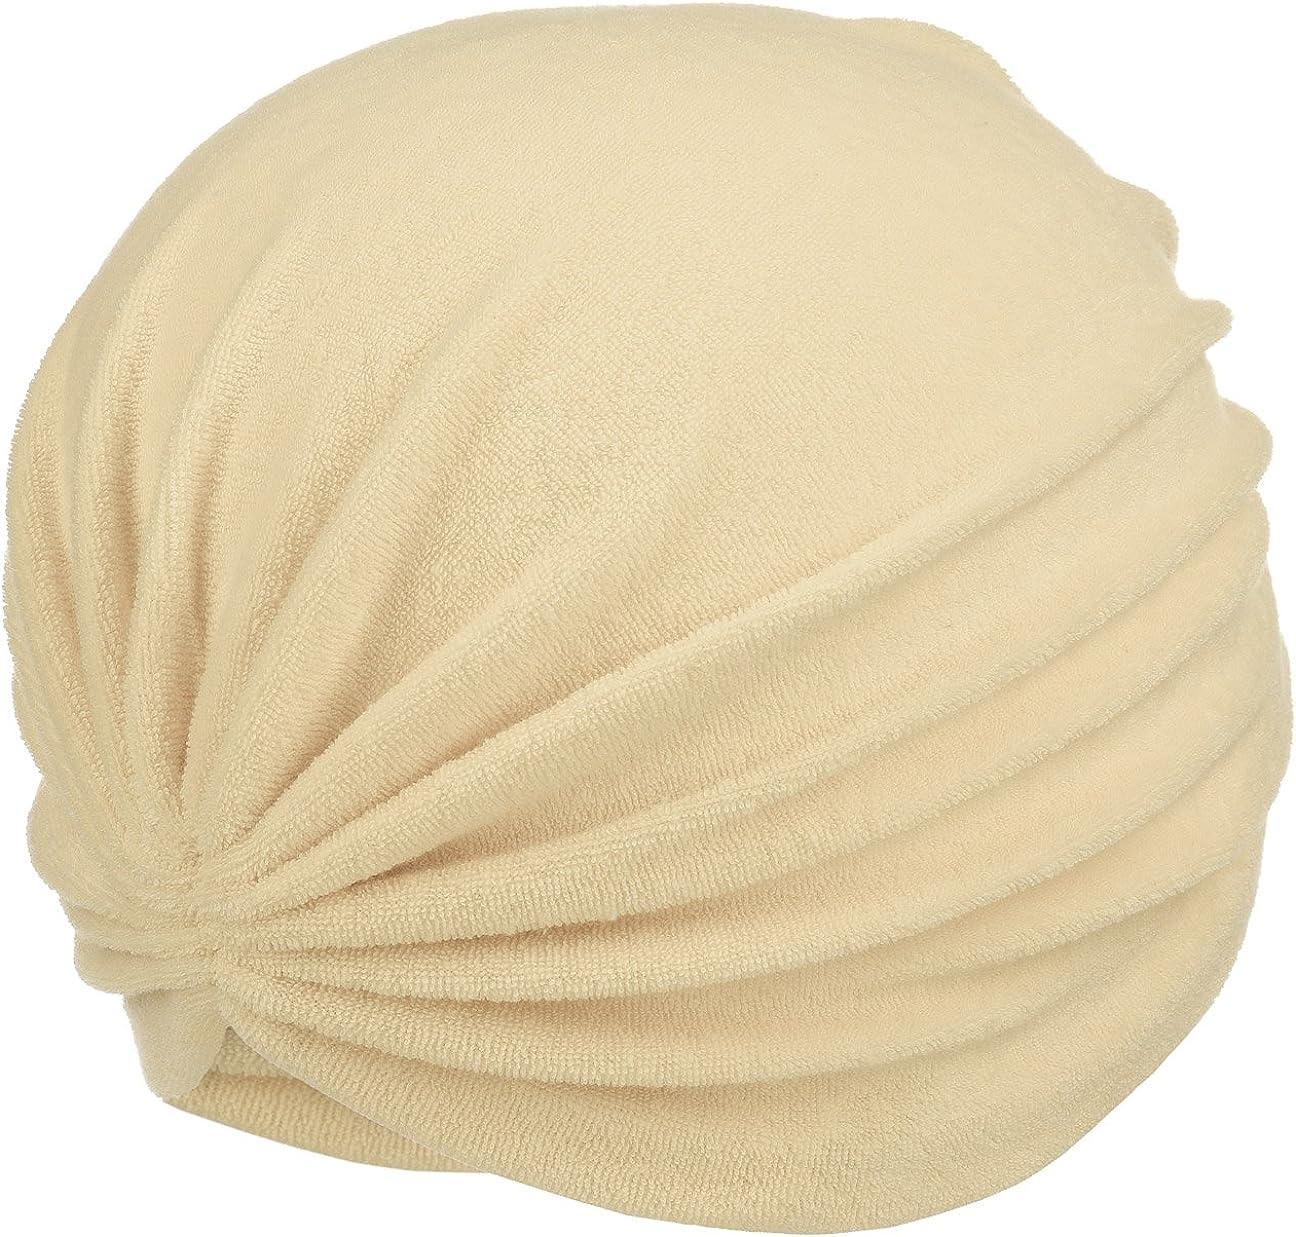 Fashy Turbante de Secado para Mujer